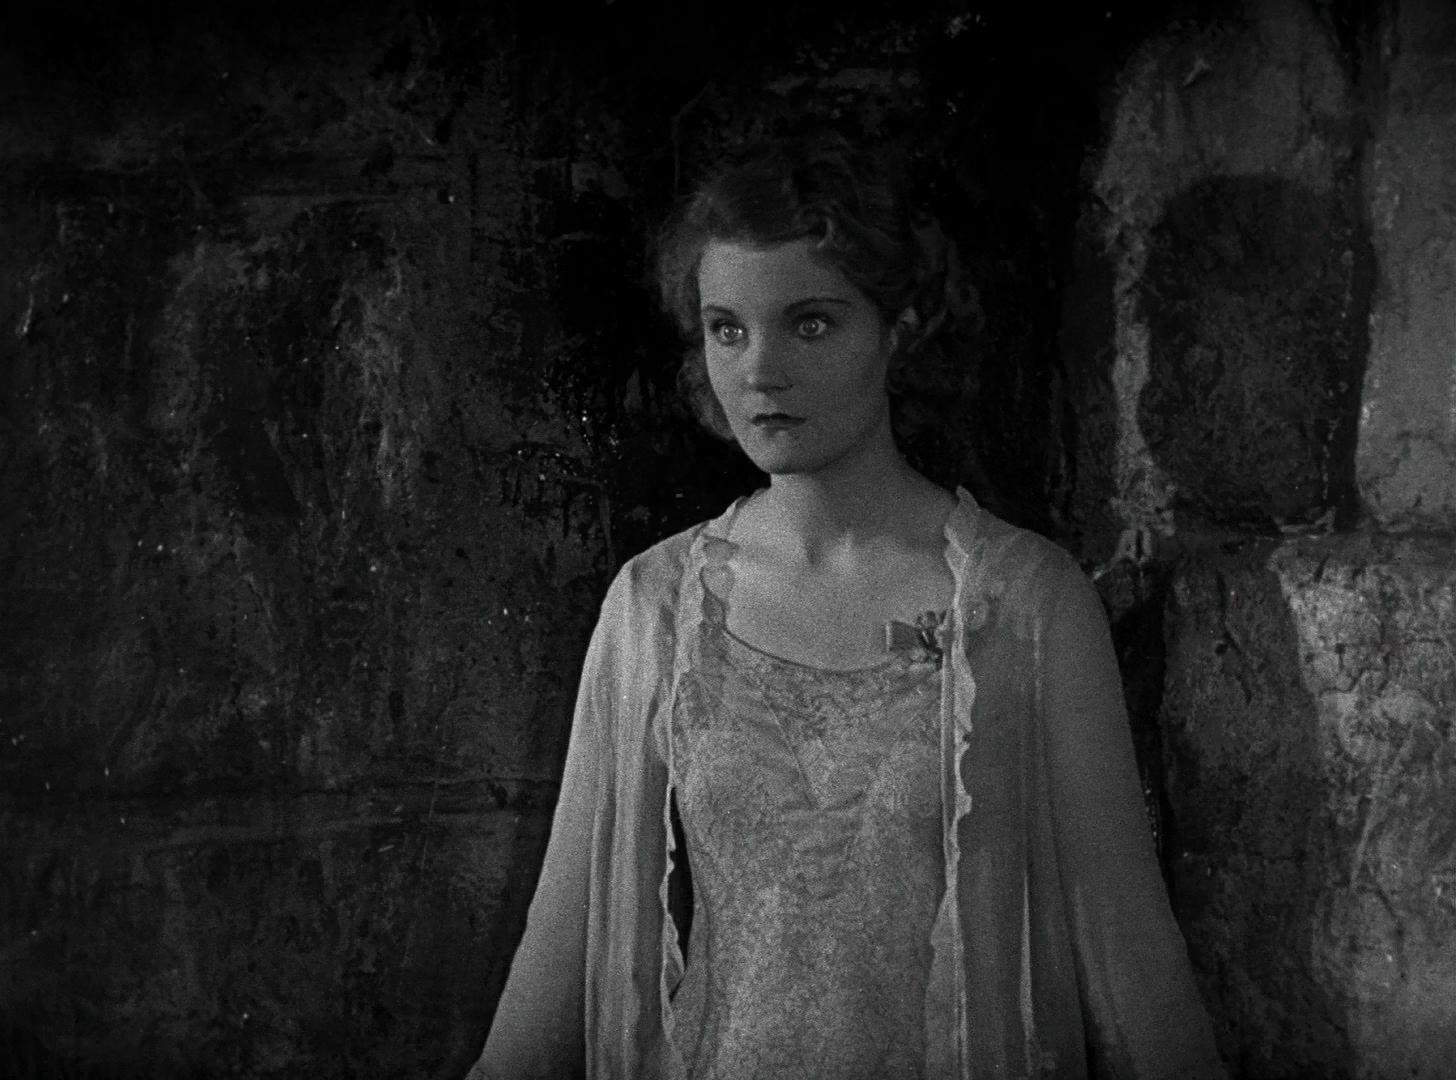 Dracula (1931) Bela Lugosi|1080p|Eng-Cast|MEGA